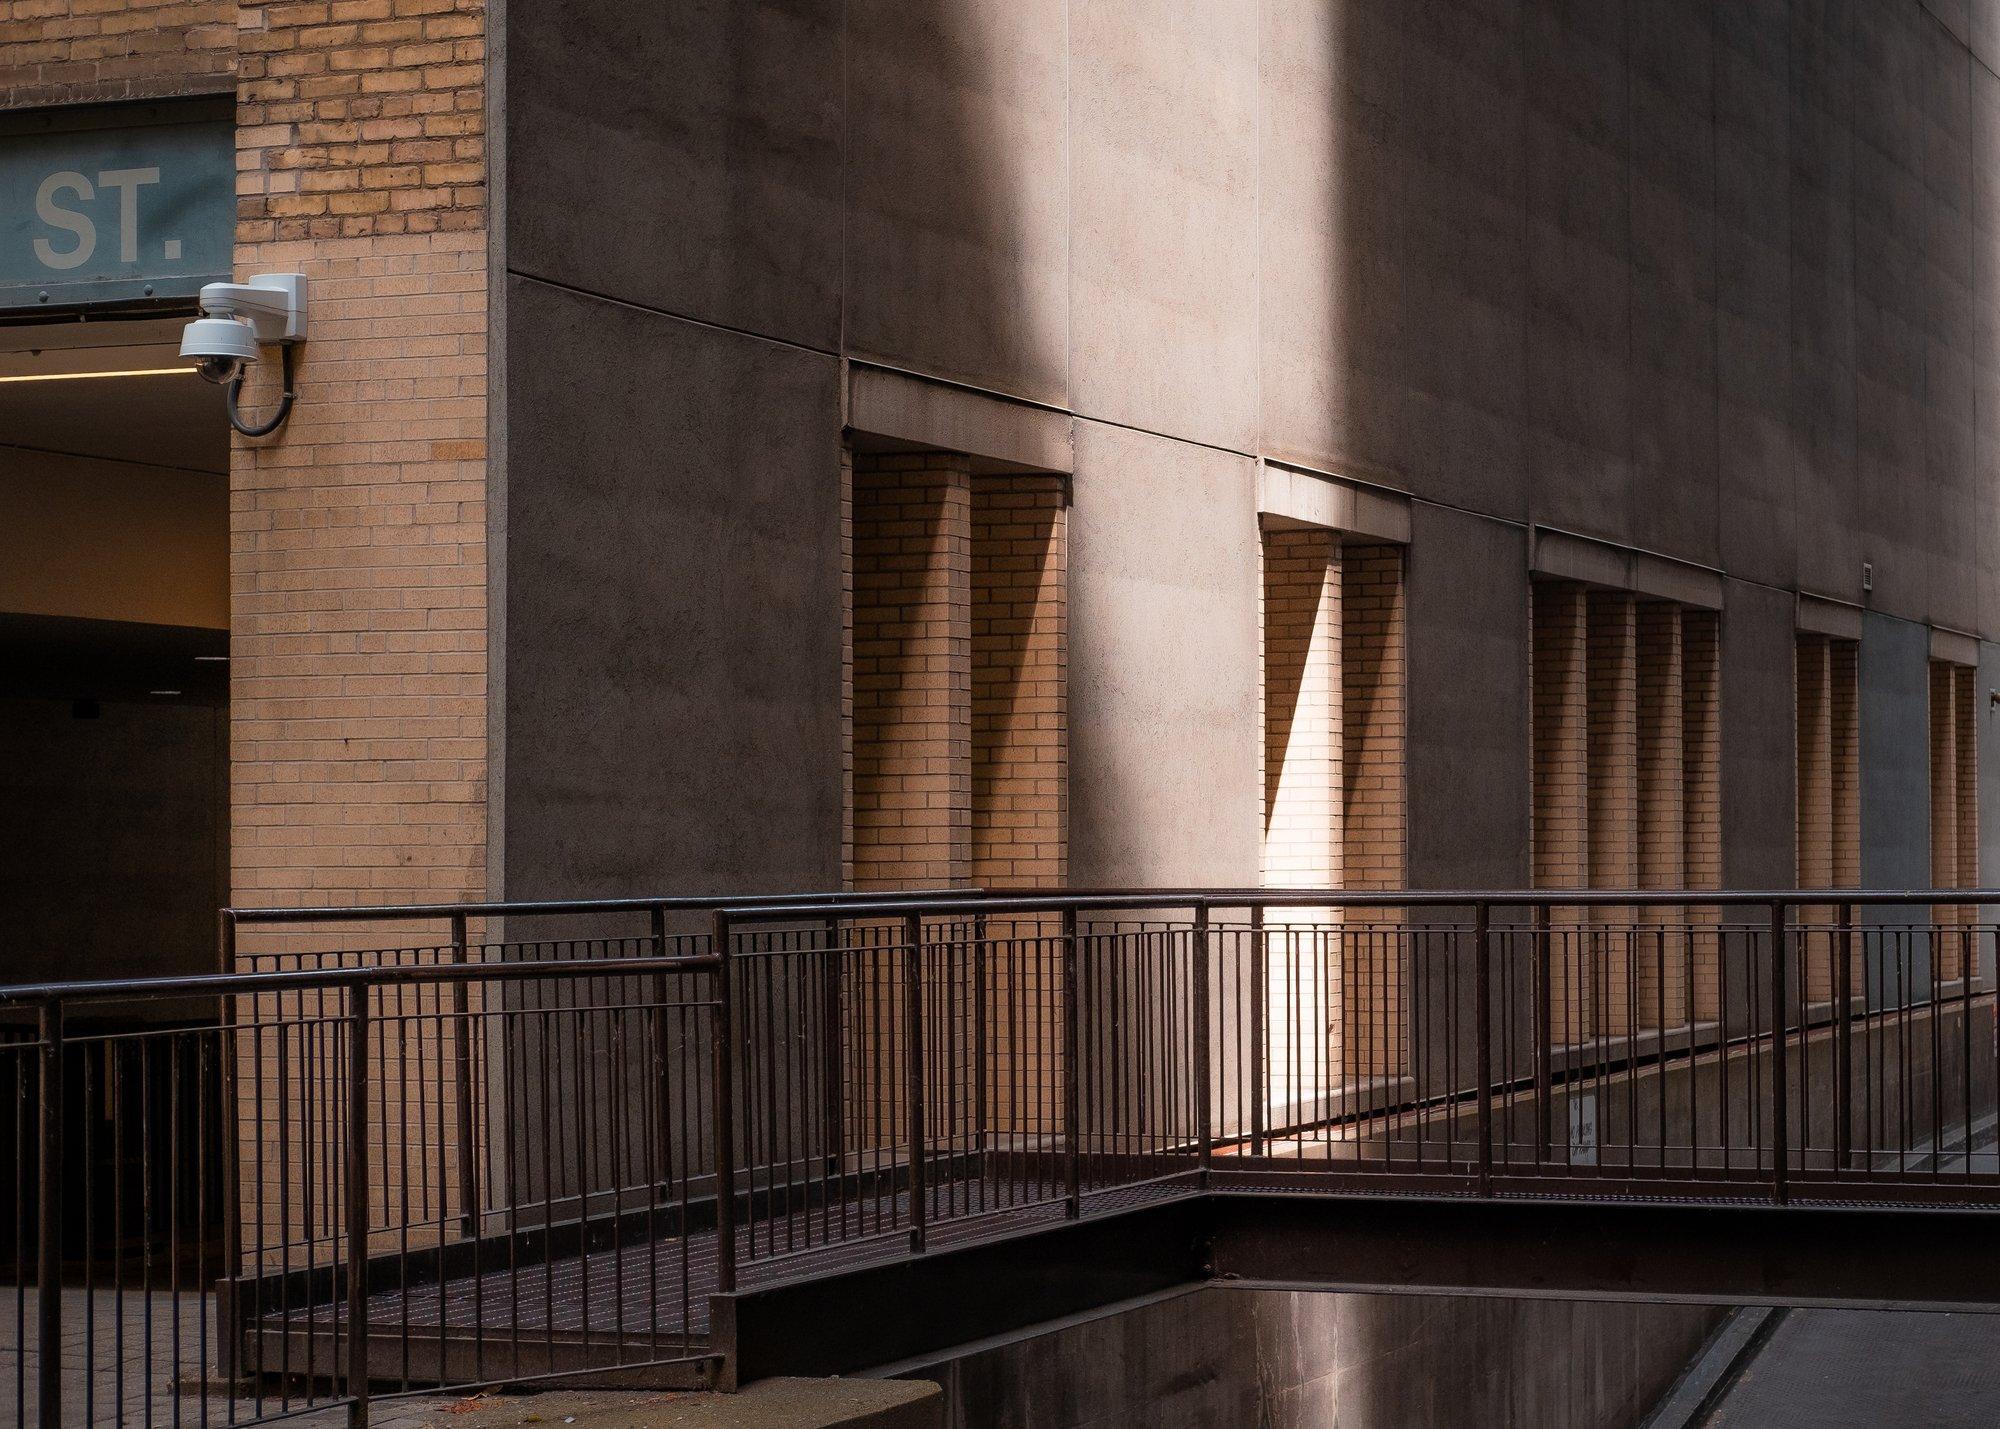 a beam of light strikes the side of a city building 一束光线击中了一座城市建筑的侧面。